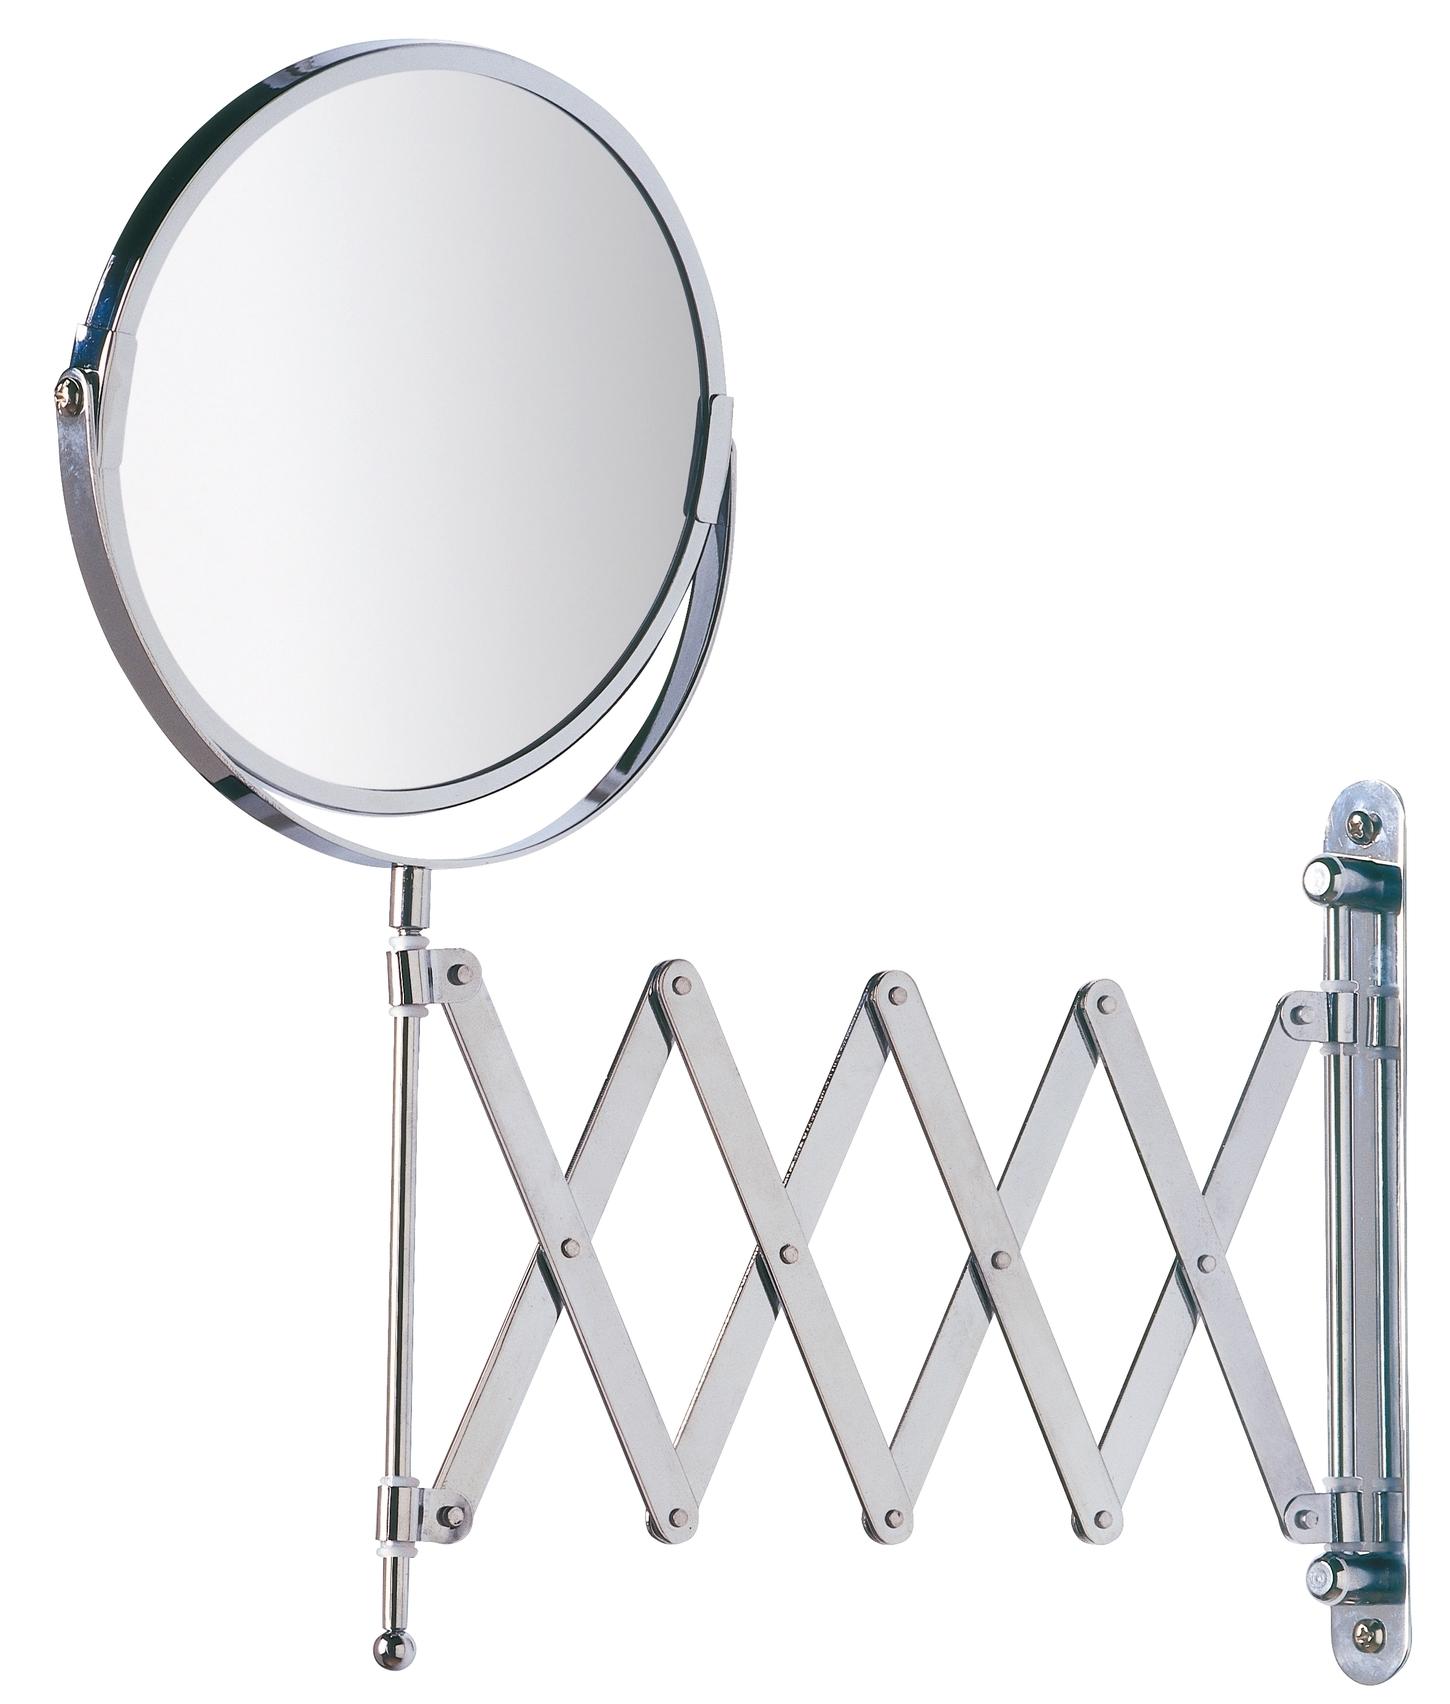 Oglinda cosmetica de perete, extensibila, Exclusiv Crom, Ø16xl19-50xH38,5 cm